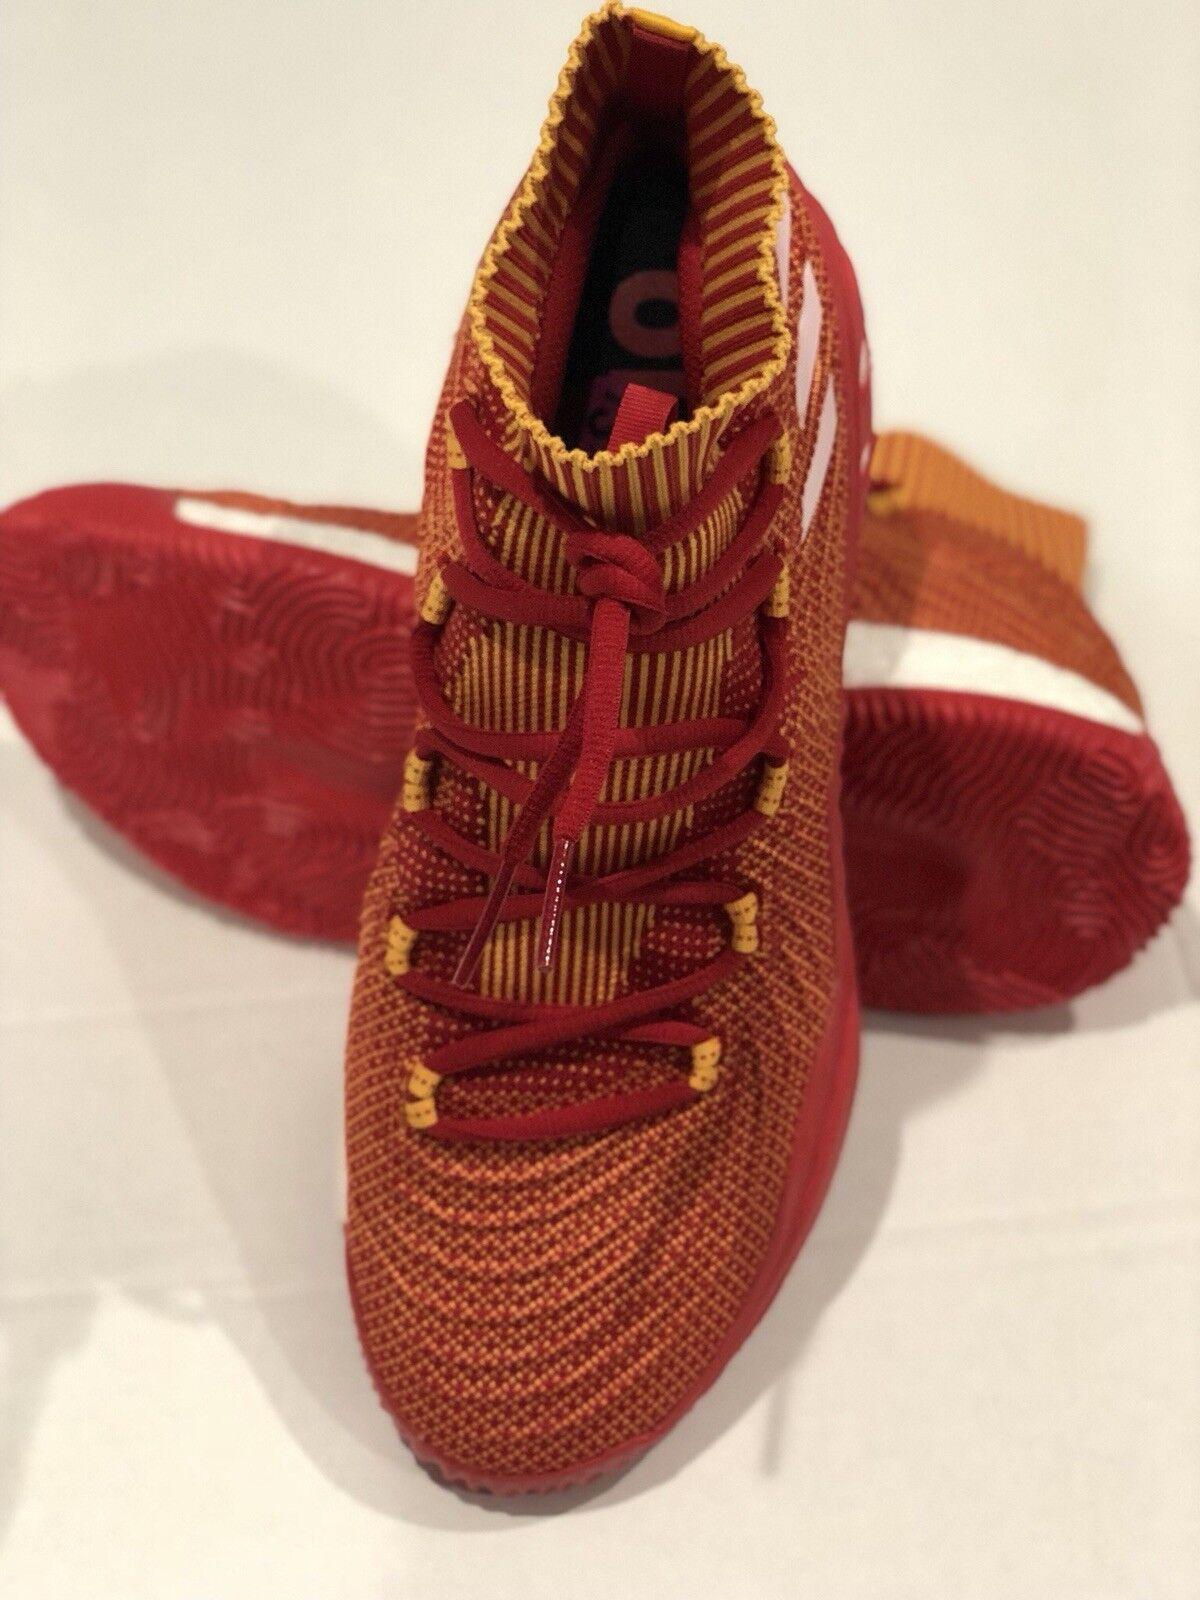 Eric Gordon Adidas Crazy Explosive PK Promo Basketball shoes 13.5 New AC8664